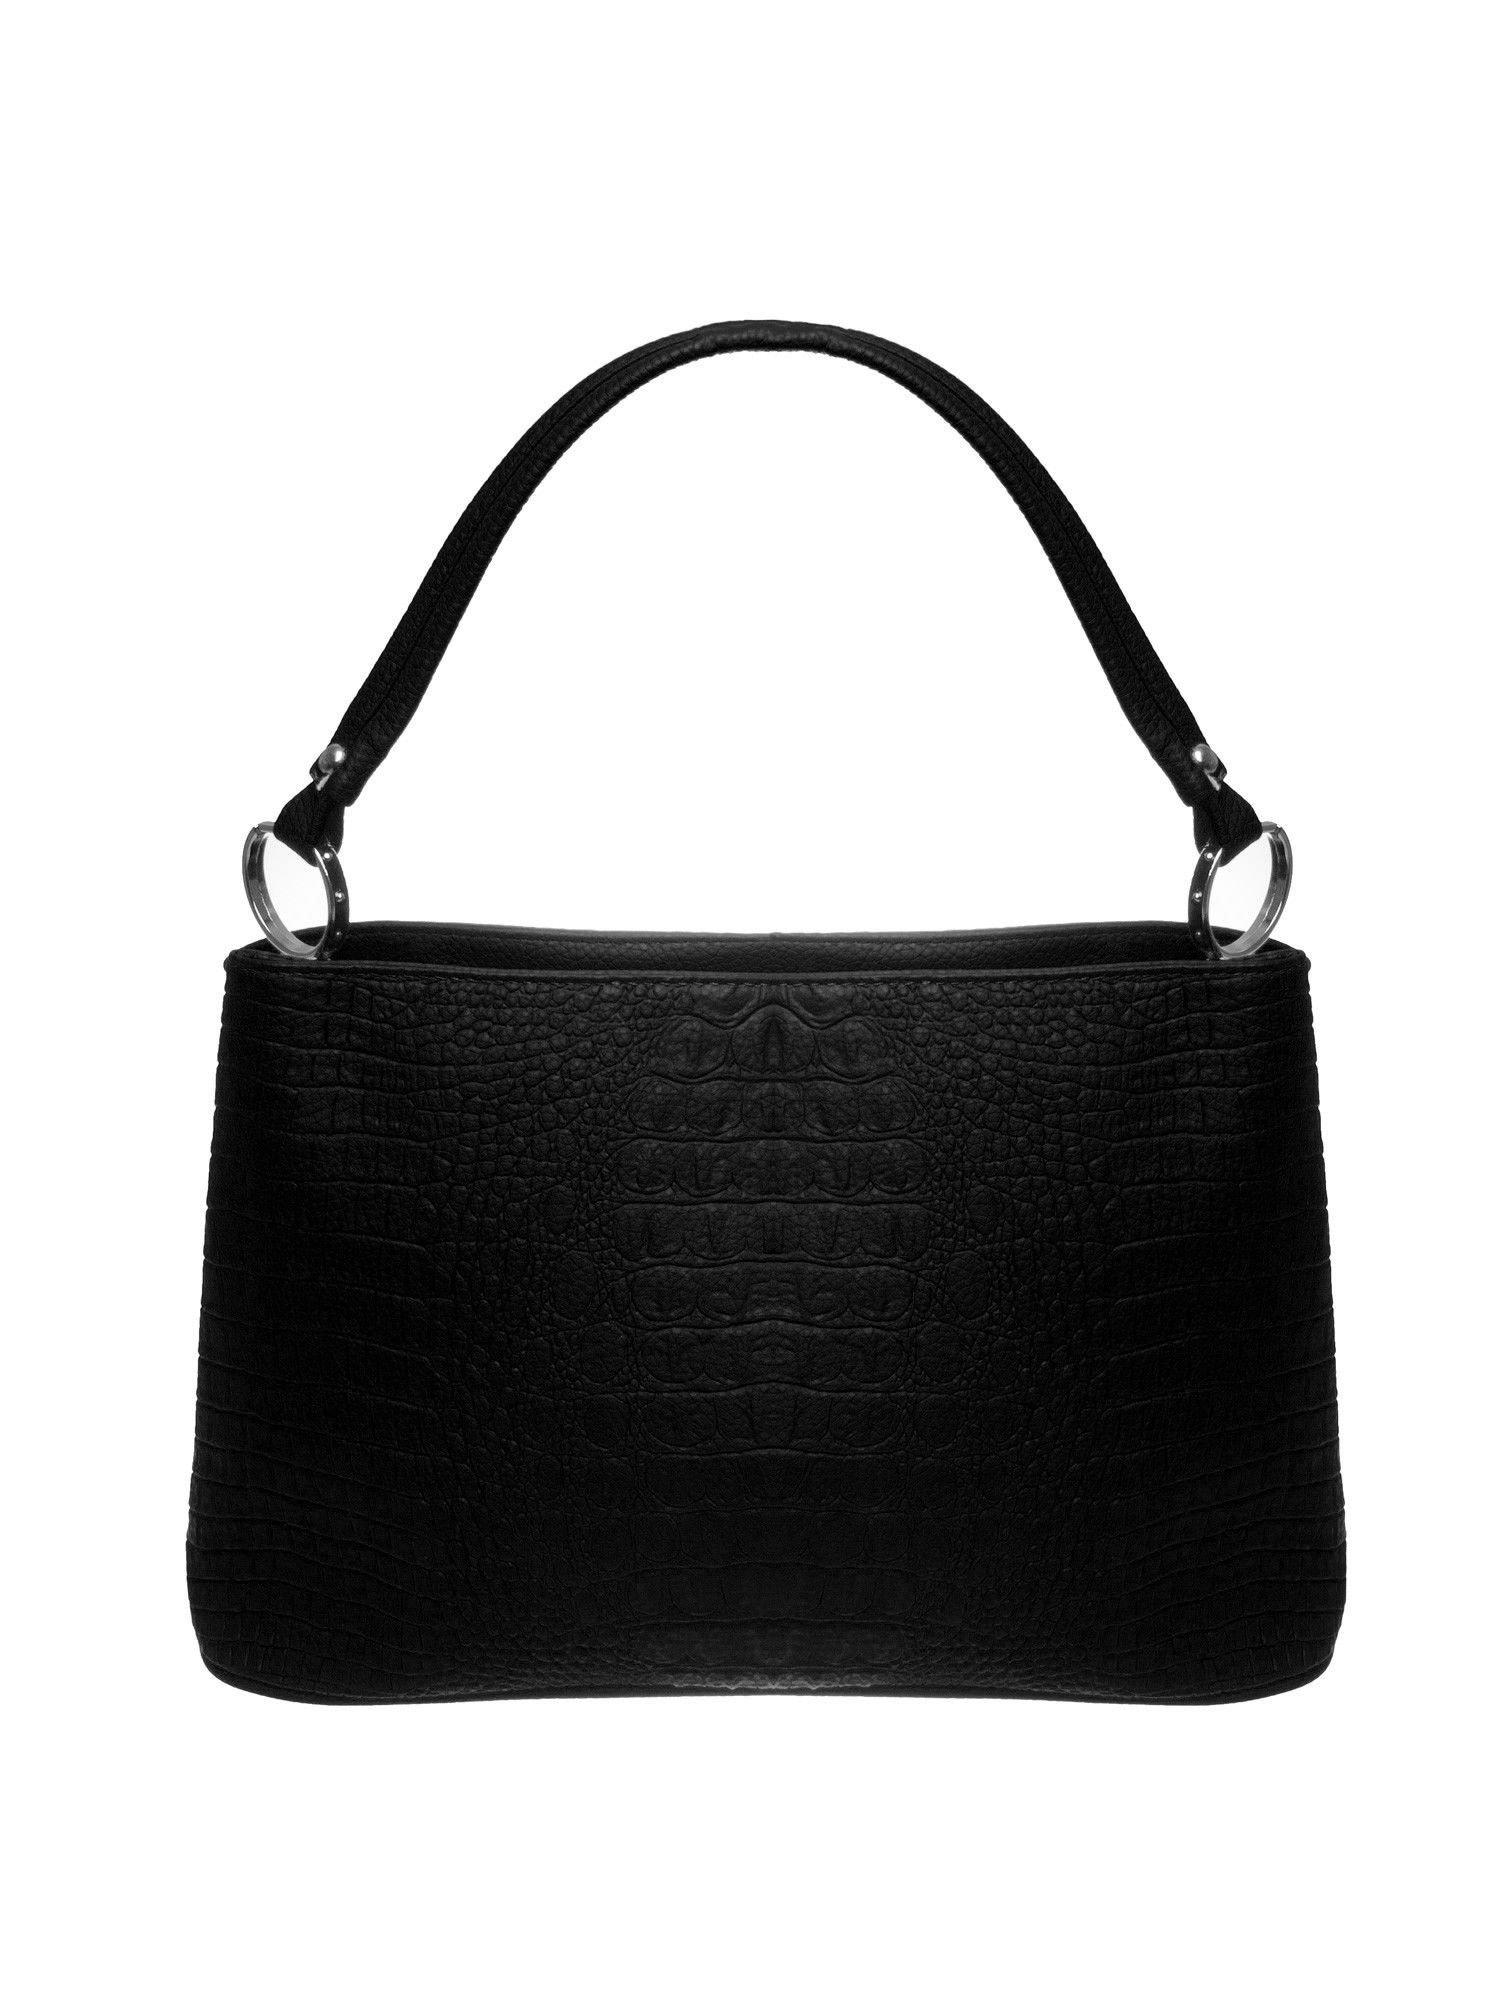 Czarna torebka na ramię tłoczona na wzór skóry krokodyla                                  zdj.                                  1